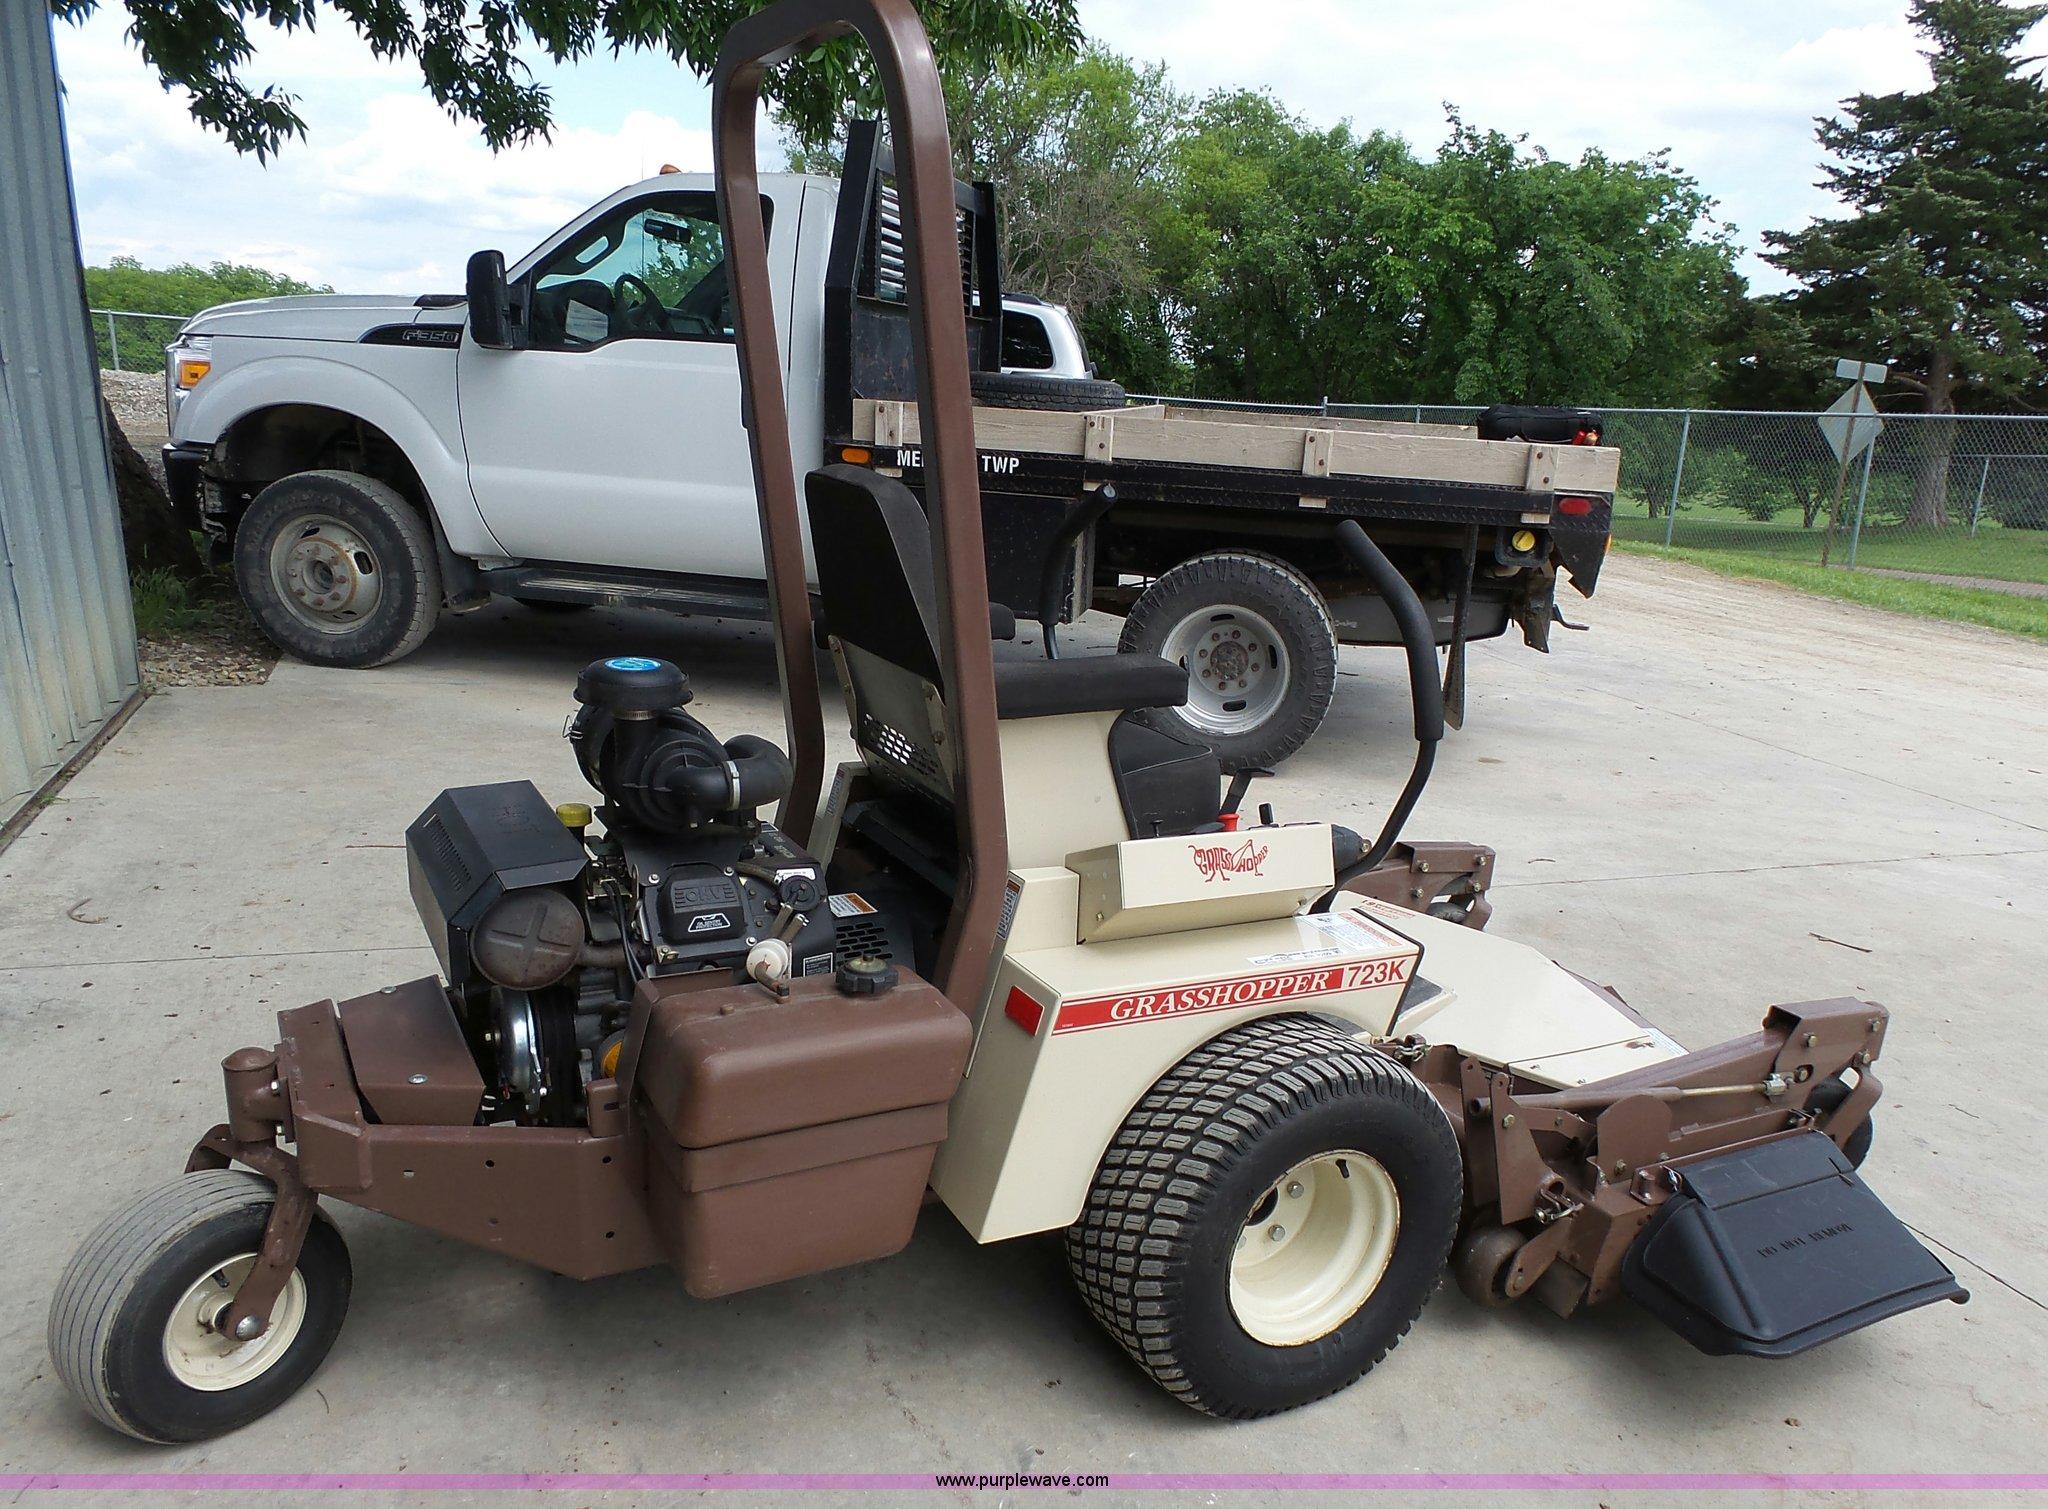 Grasshopper 723K ZTR lawn mower | Item BR9209 | SOLD! June 7